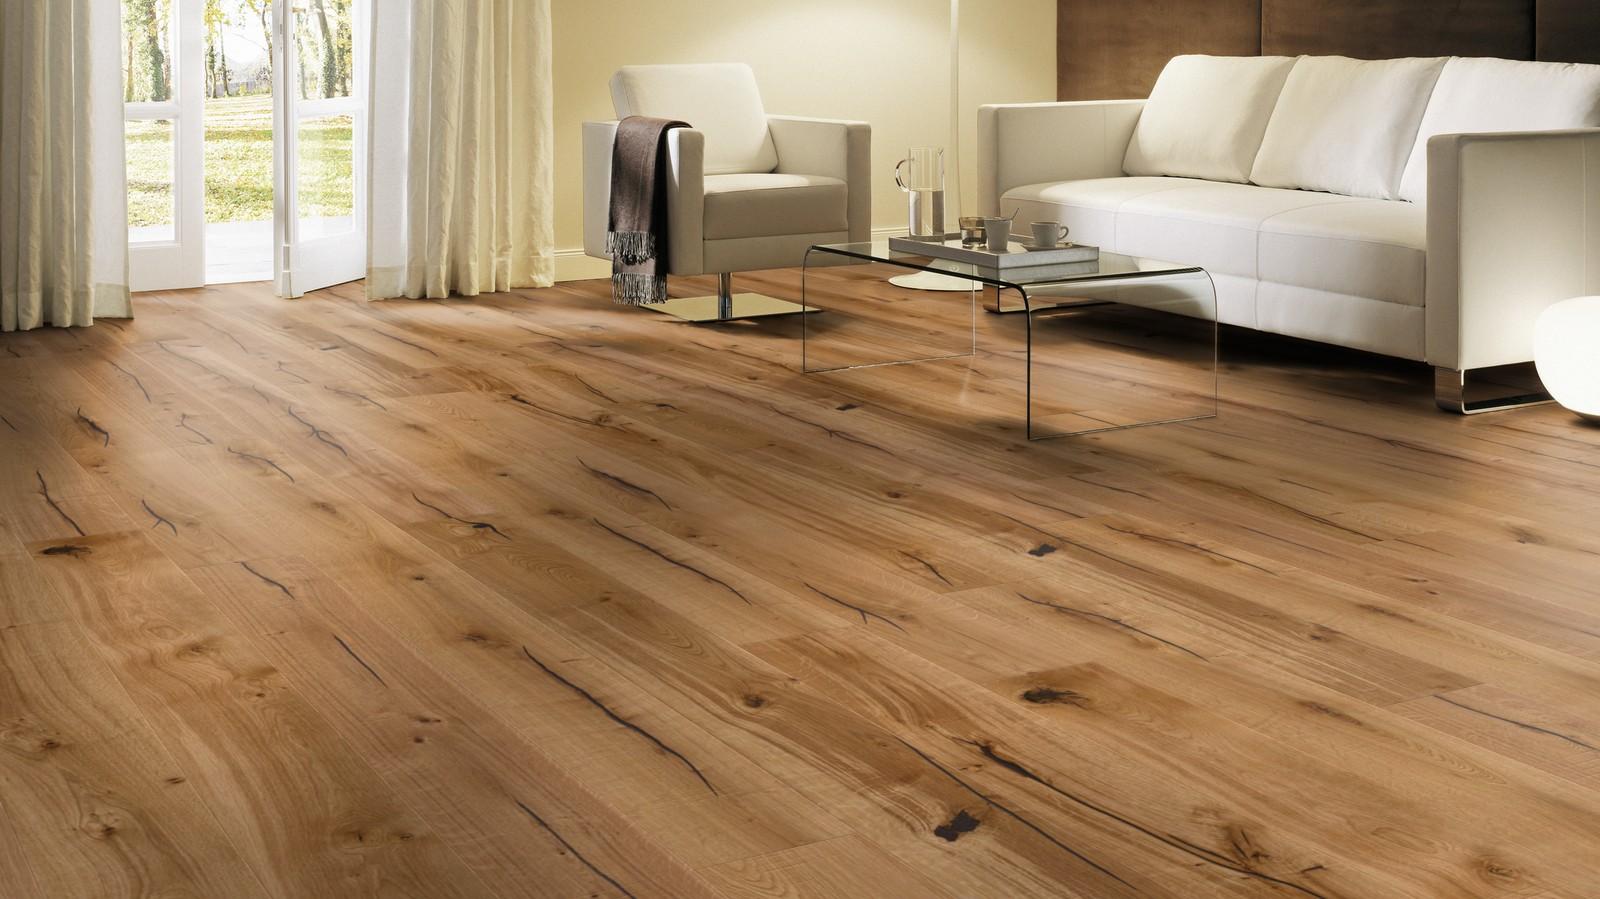 landhausdiele eiche canyon natur ge lt parkett online shop timbertown. Black Bedroom Furniture Sets. Home Design Ideas